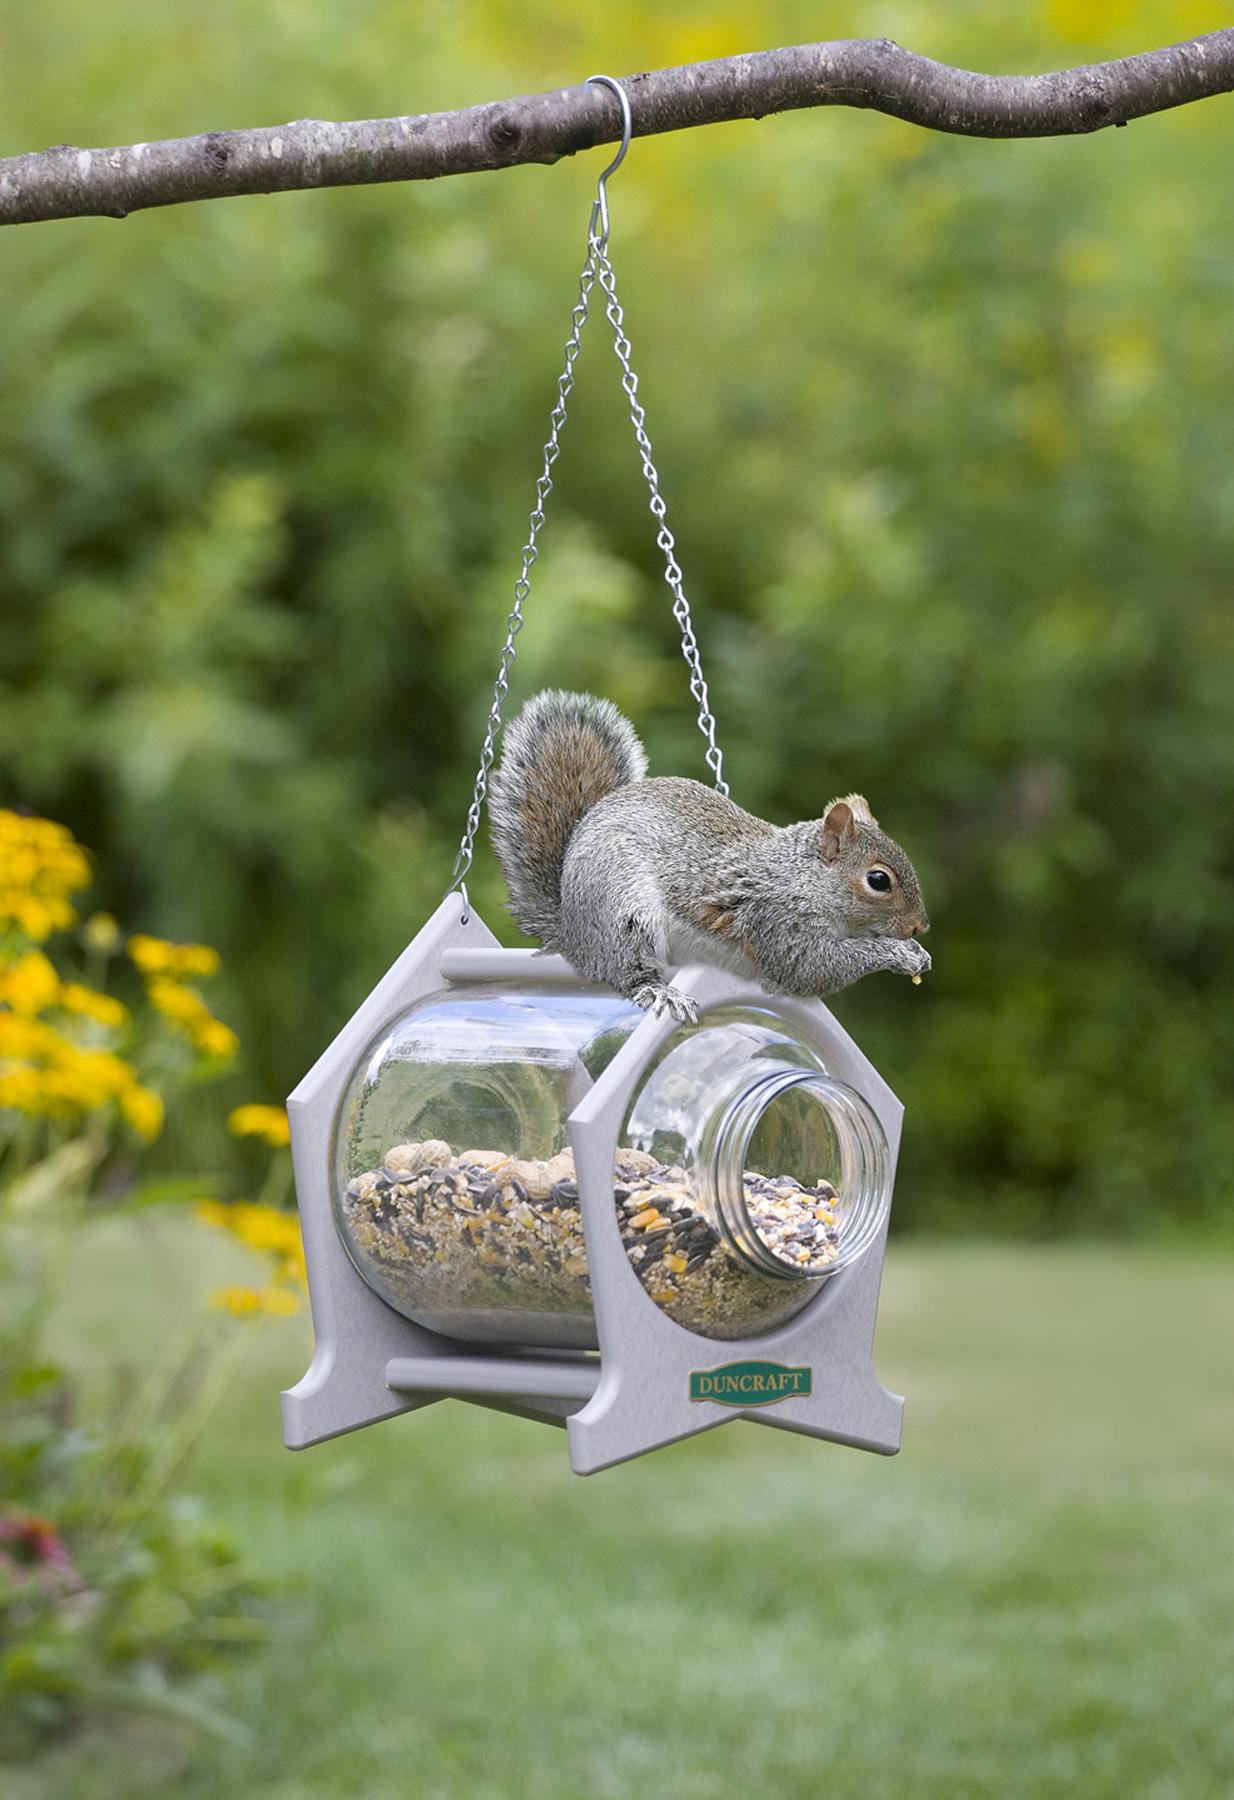 Duncraft Com Hanging Squirrel Jar